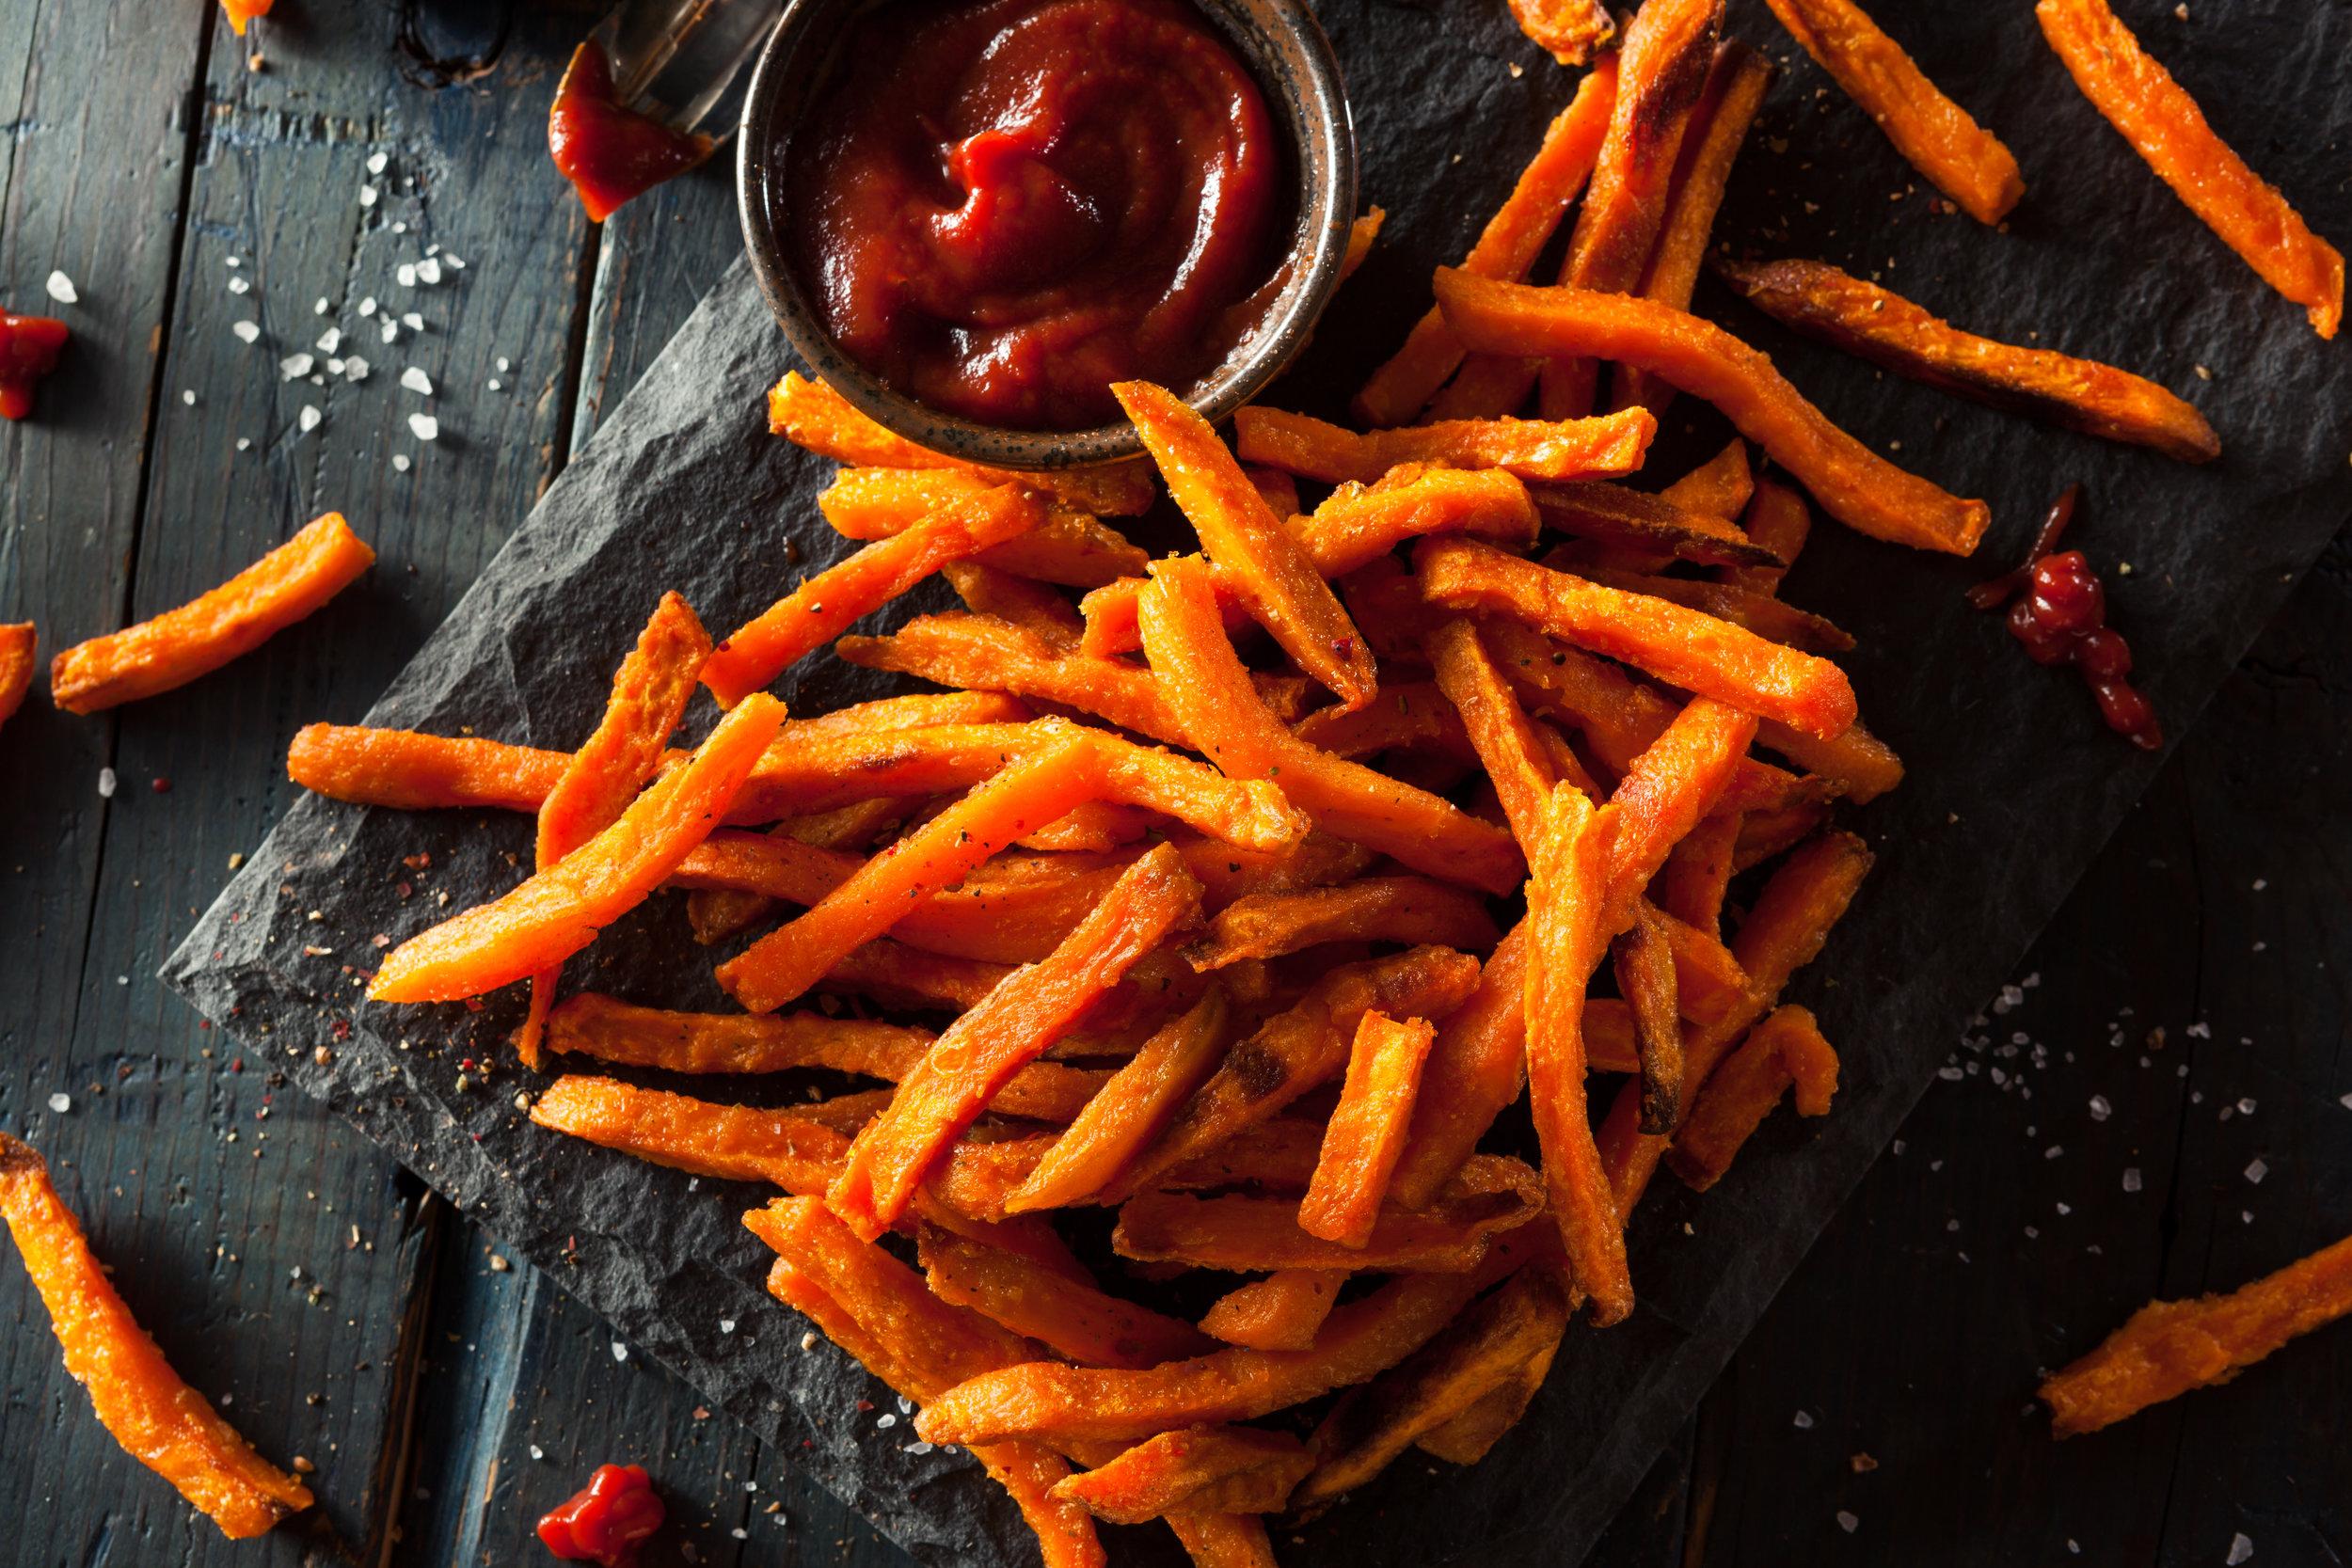 sweet potato fries vs regular potato fries which are healthier vegan nutrition nutritionist